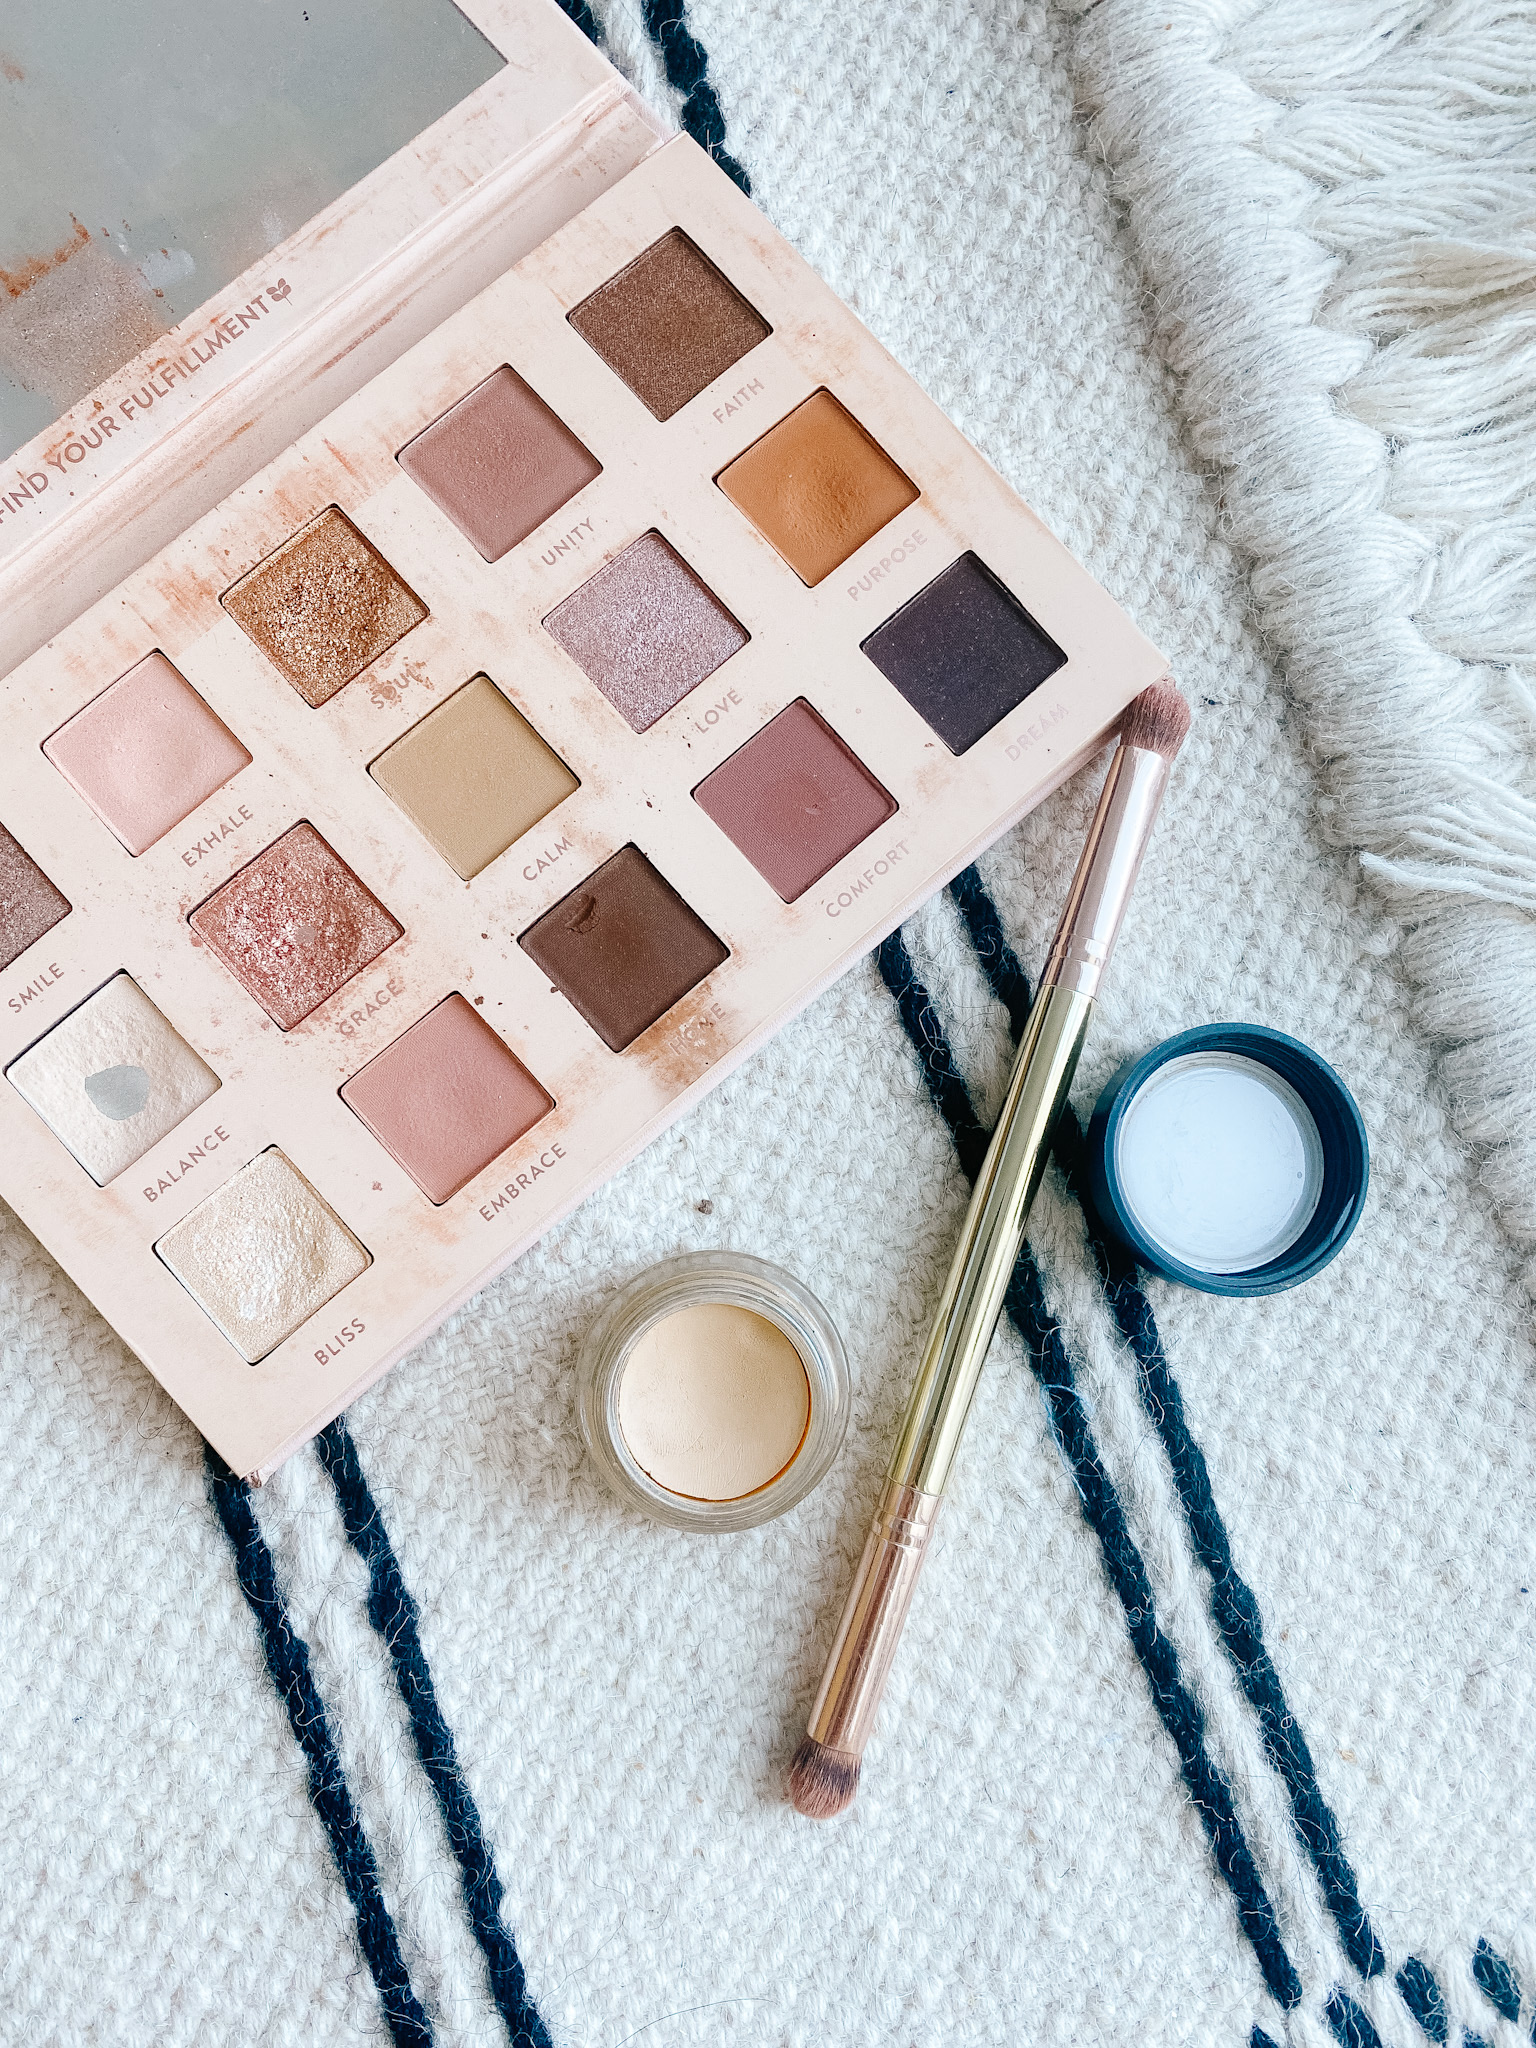 Favorite Eyeshadow and Primer